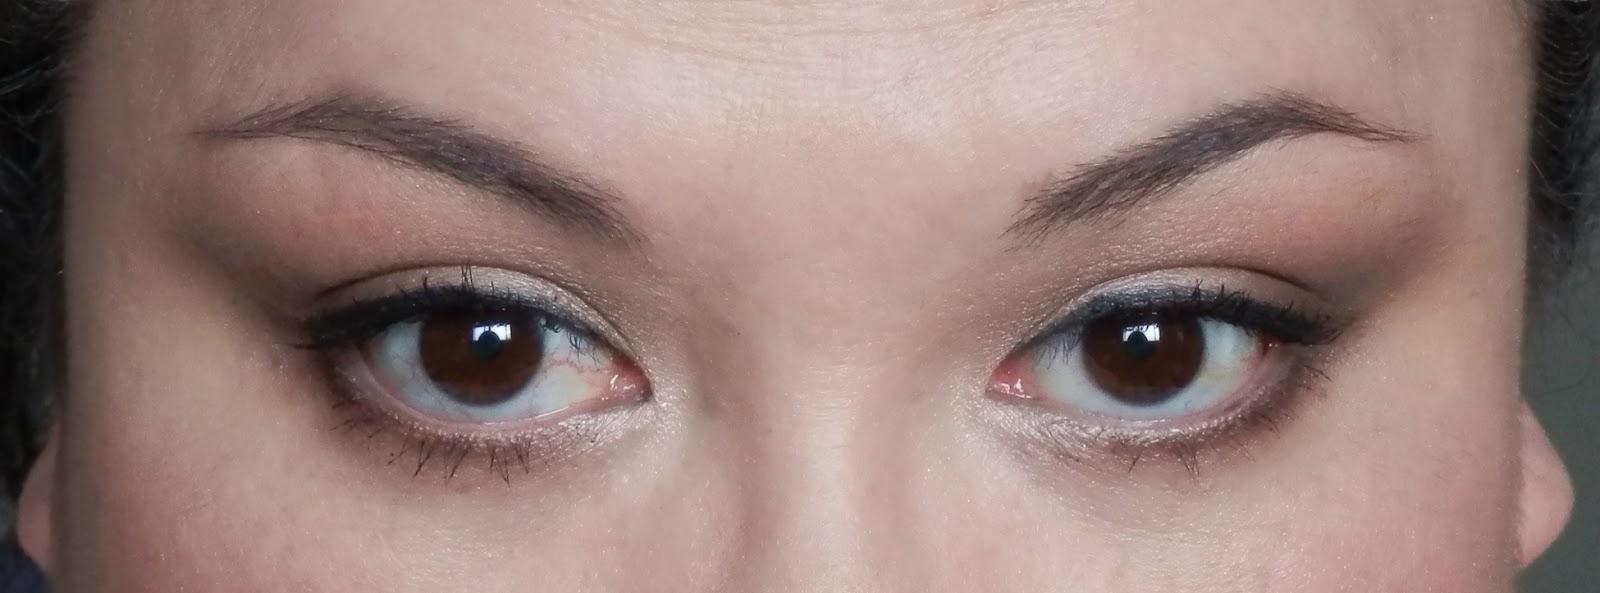 Ojos con capucha Maquillaje - Do - s y Don - ts!